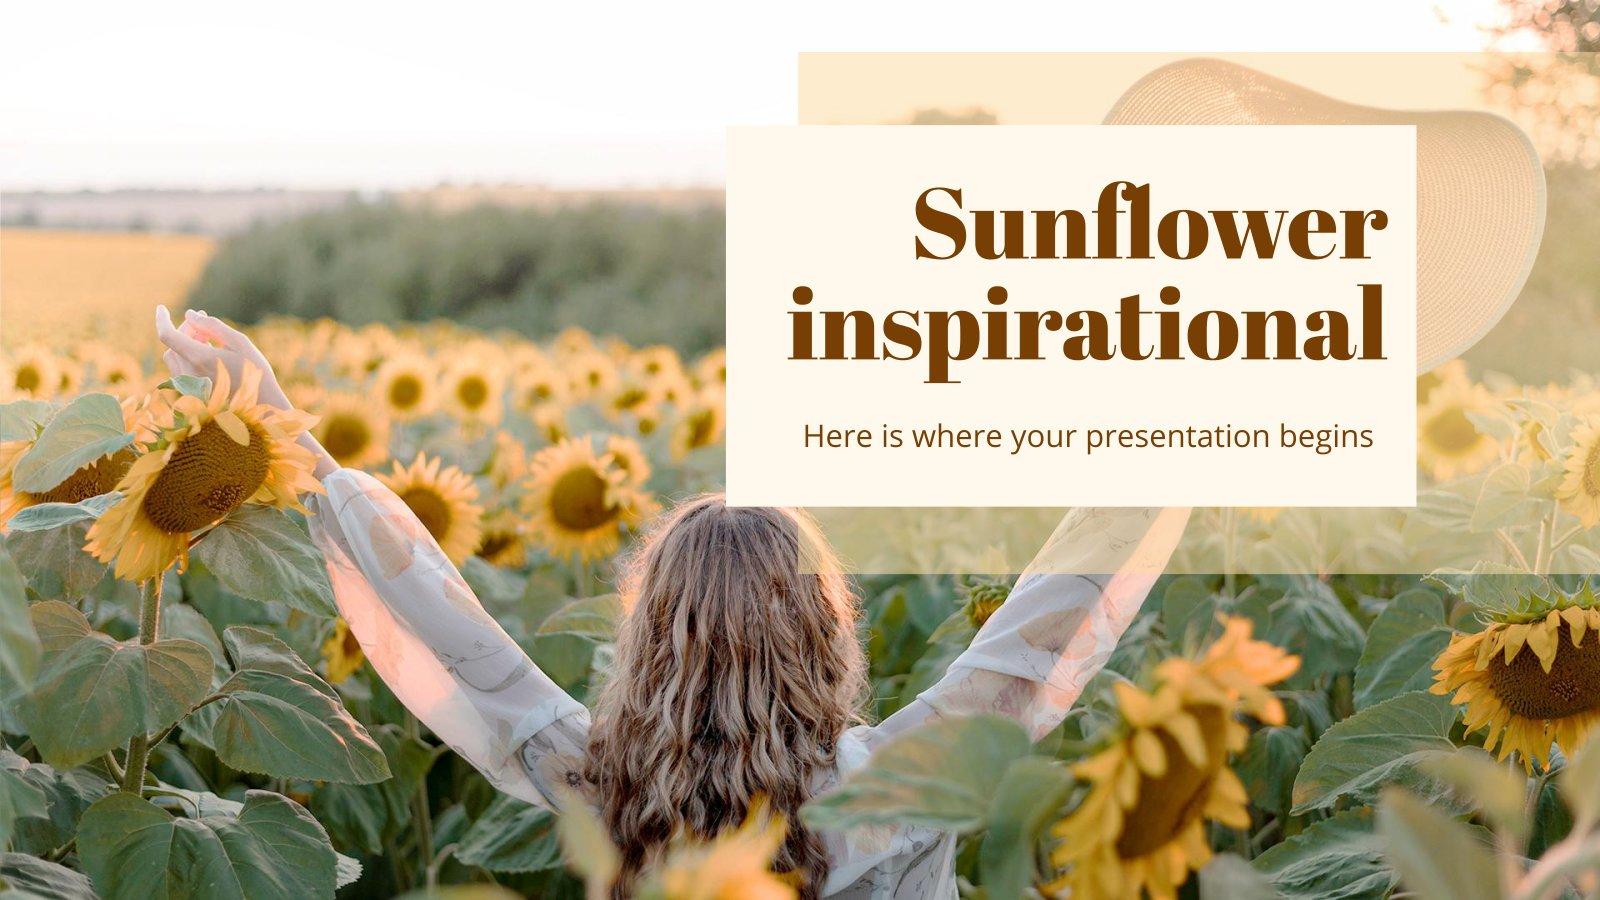 Sunflower Inspirational Presentation presentation template